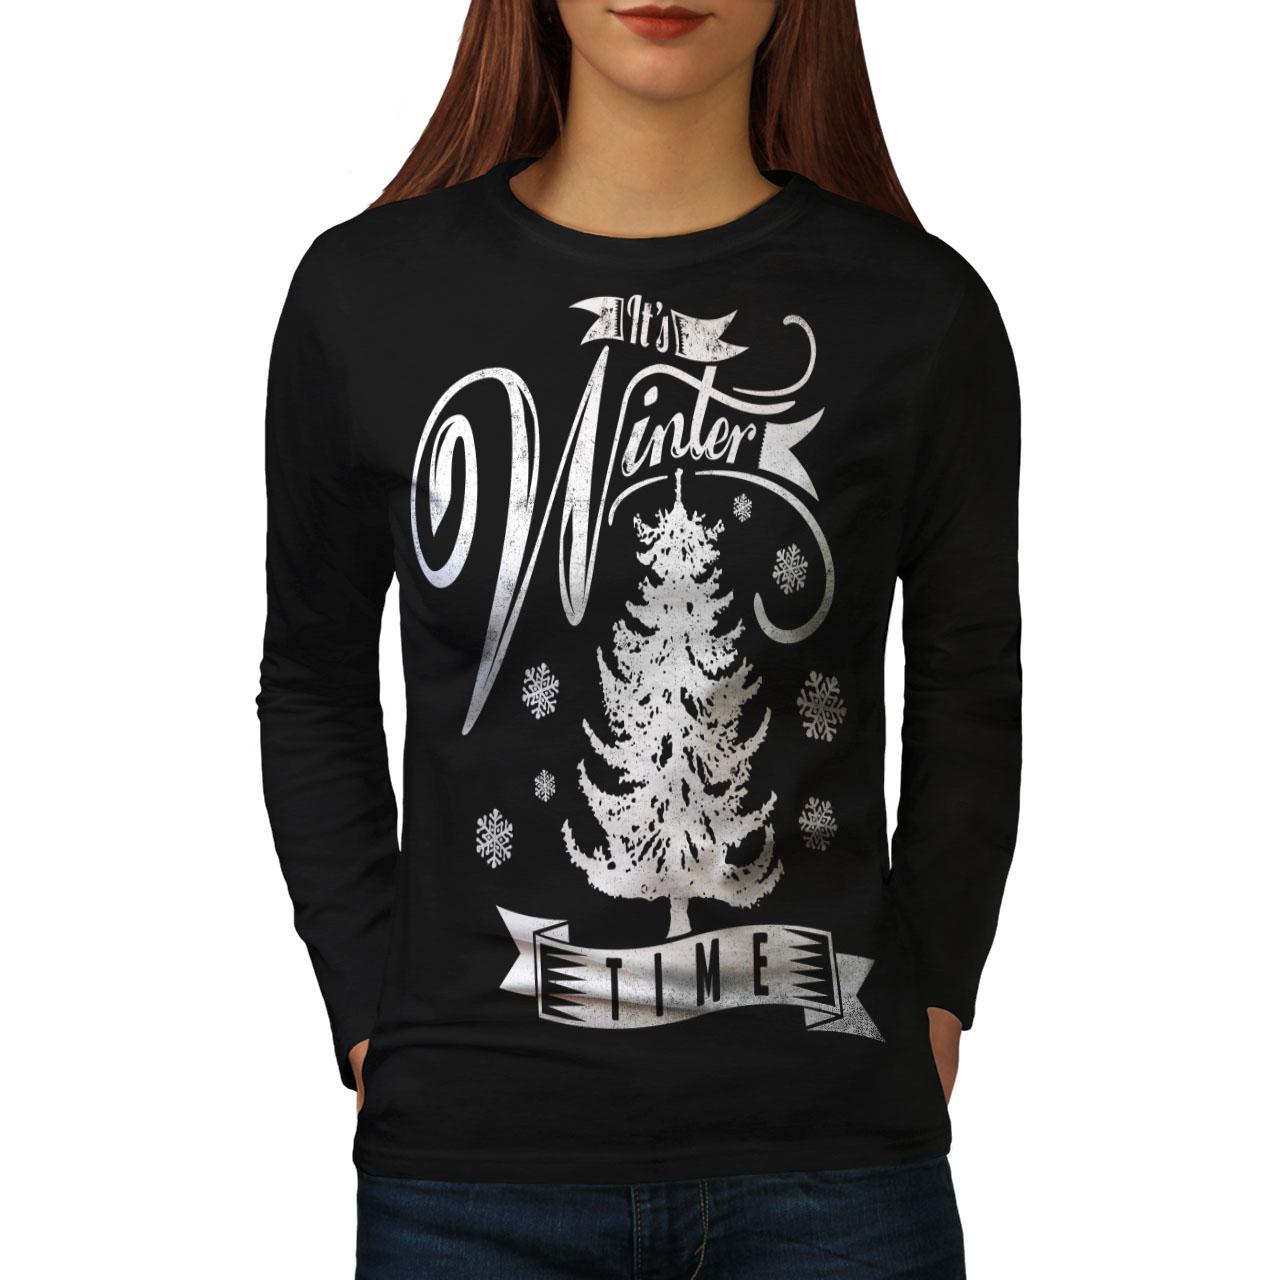 Winter Time Christmas Women Long Sleeve T-shirt NEWWellcoda